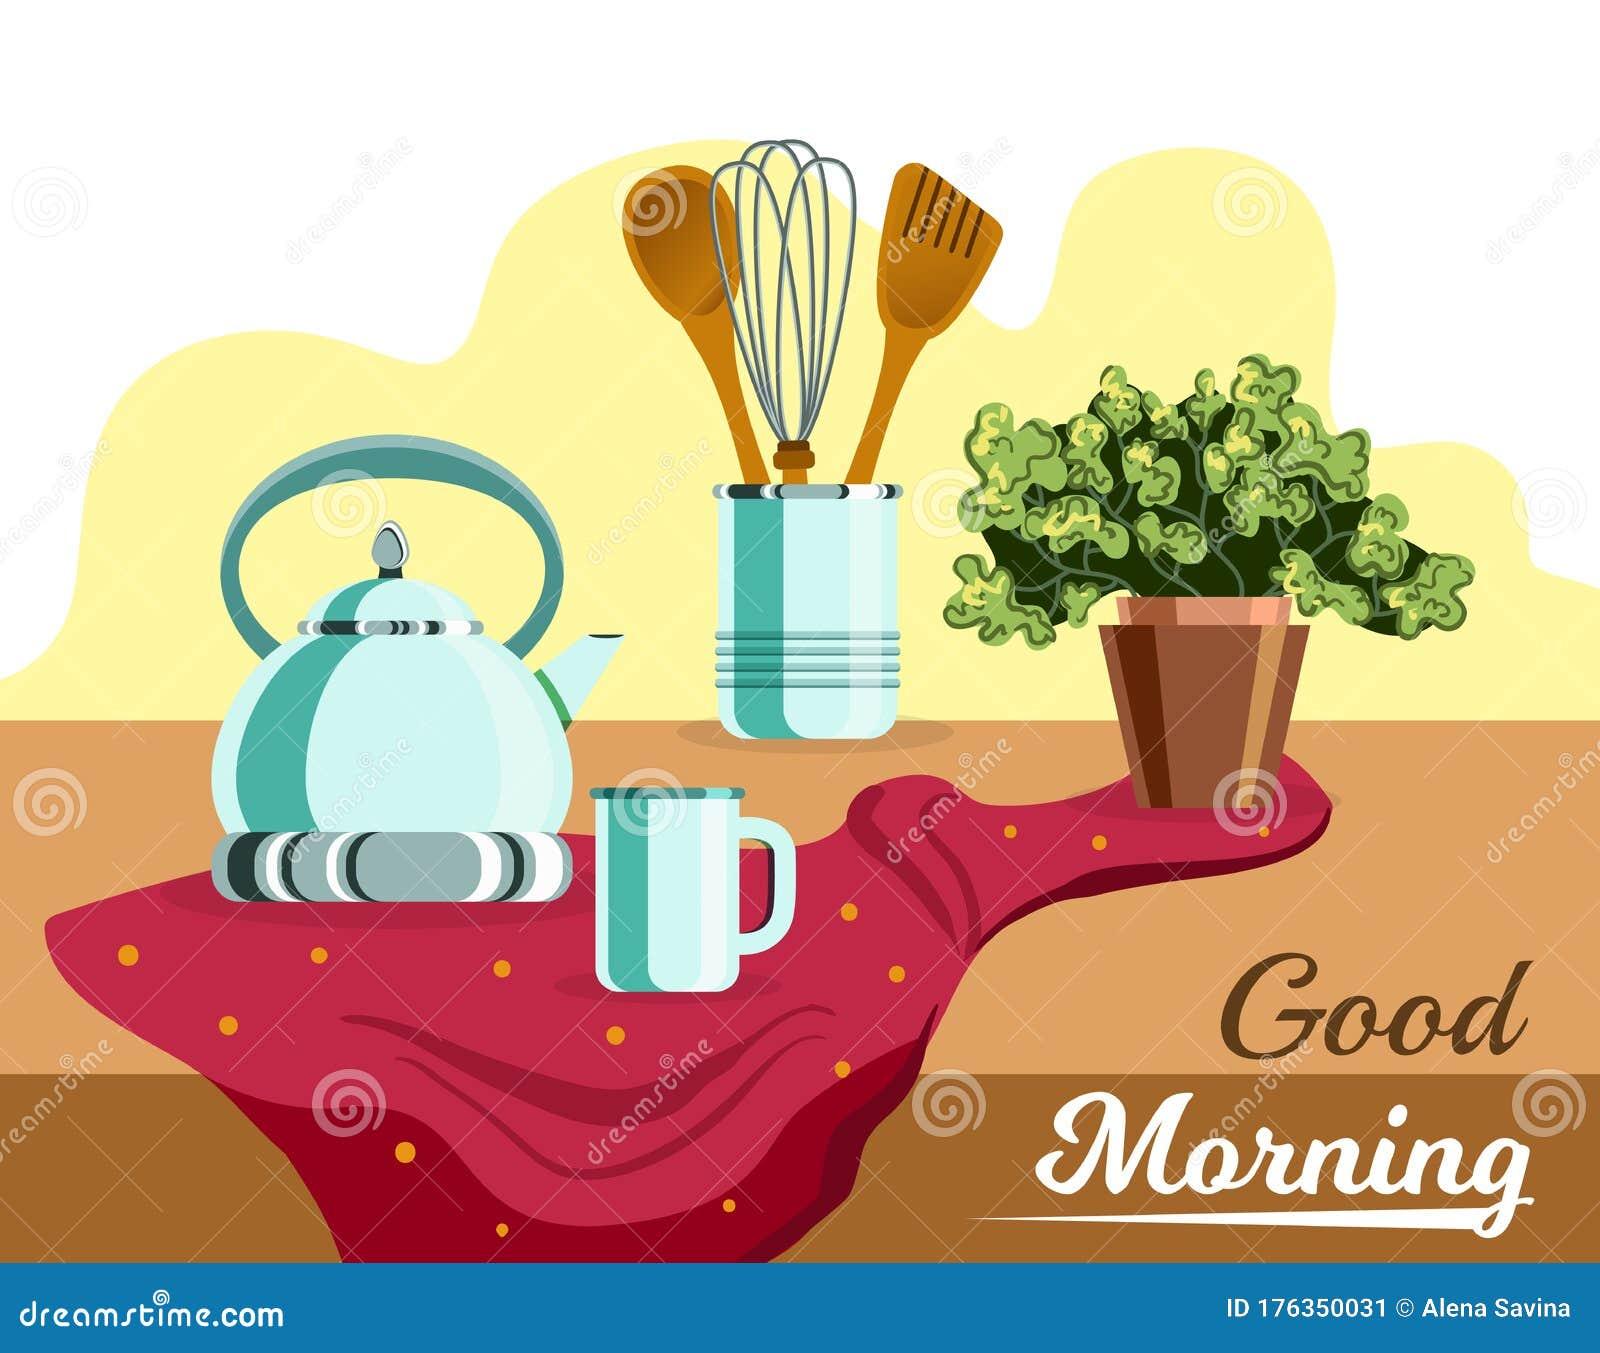 Good Morning Illustration Stock Vector Illustration Of Cover 176350031